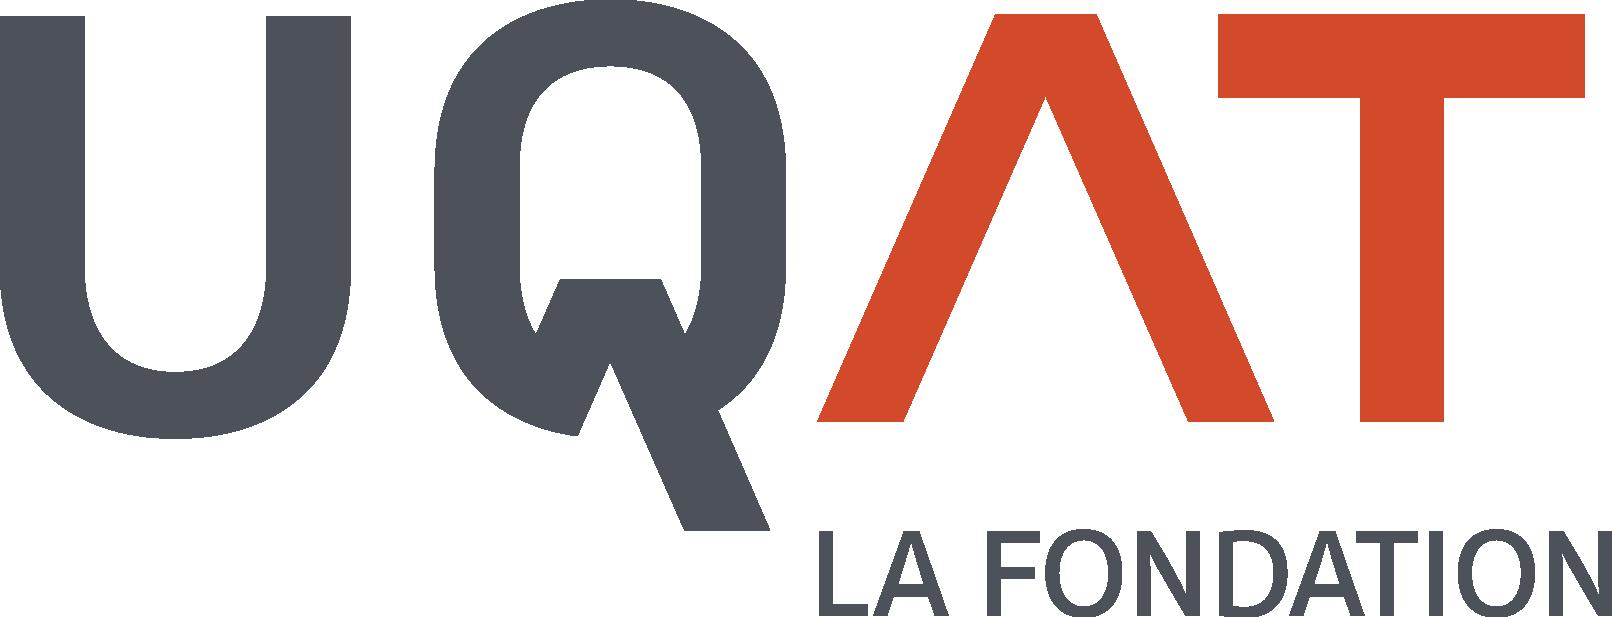 Fondation UQAT